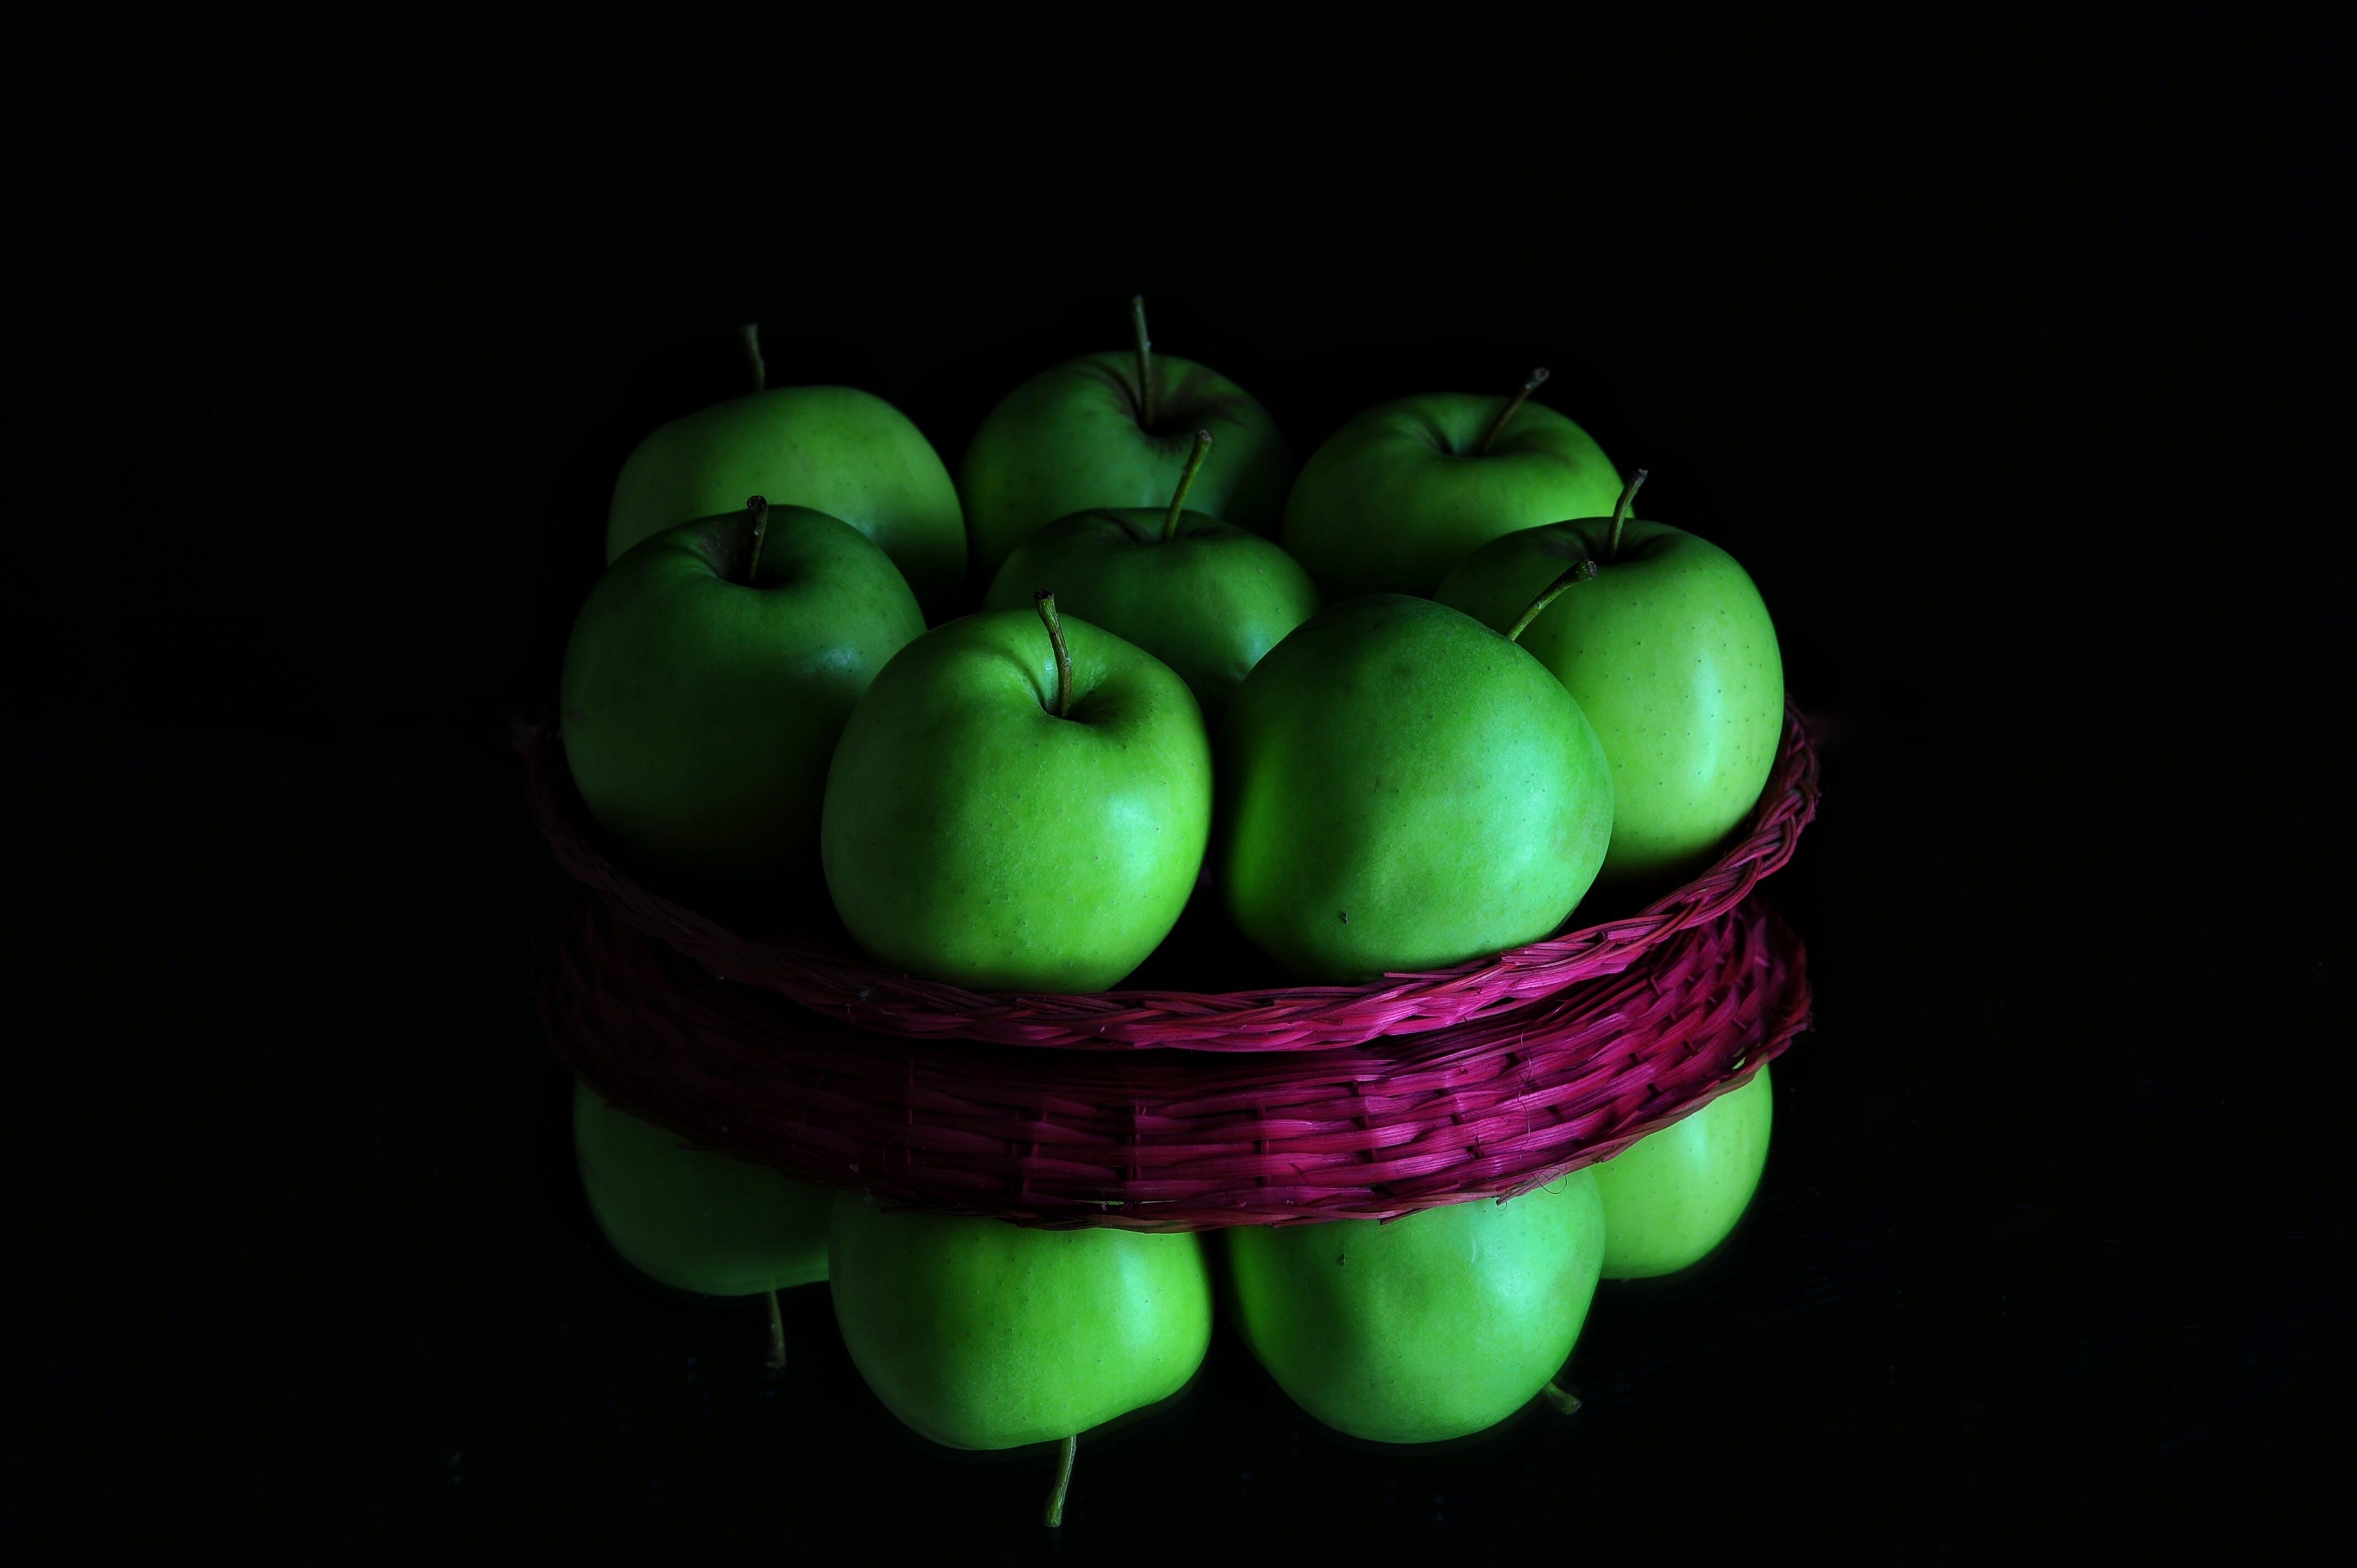 apple, apples, basket